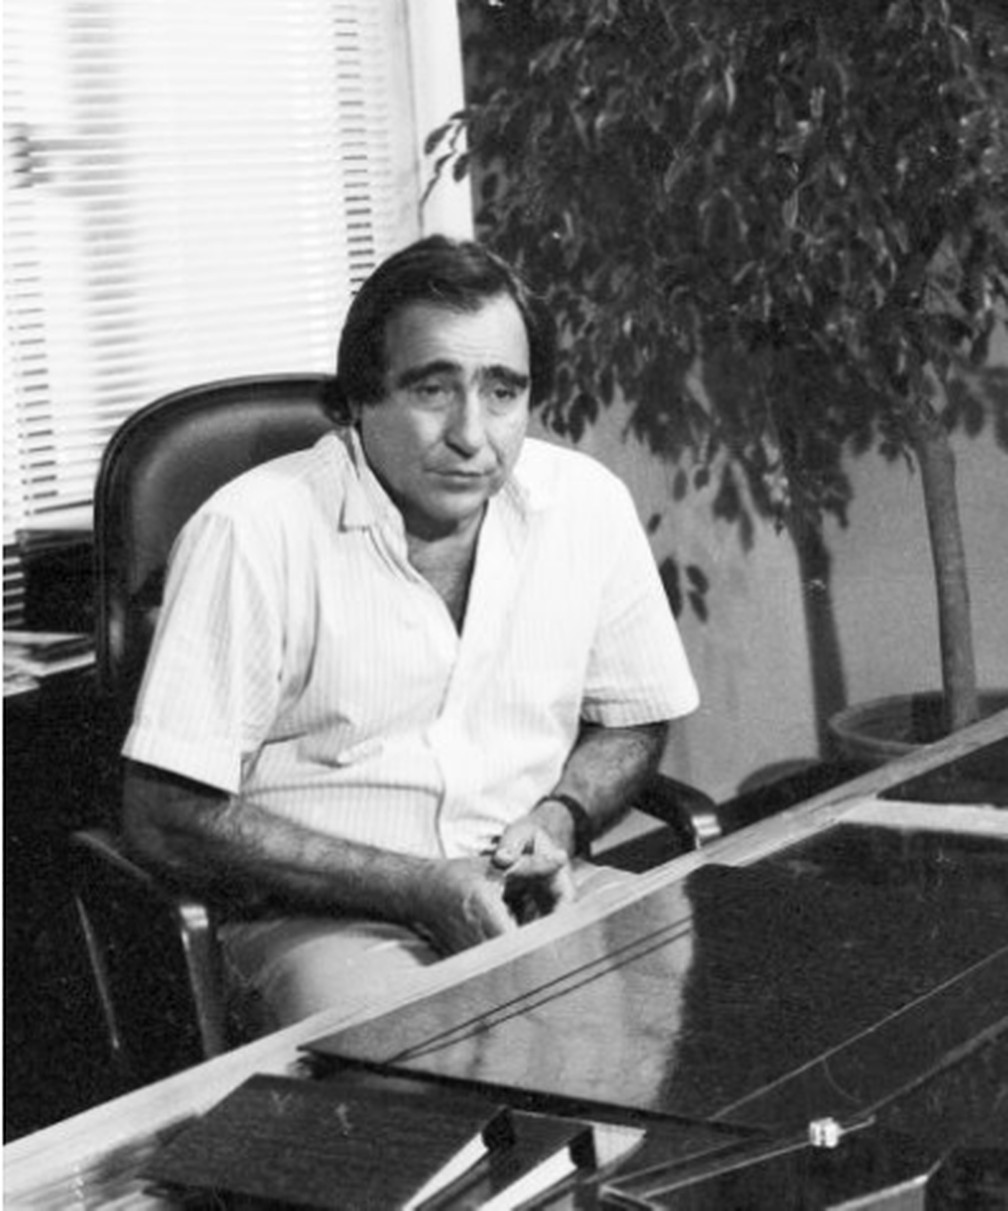 Luis Gustavo em Mico Preto, 1990.  — Foto: Acervo/Globo